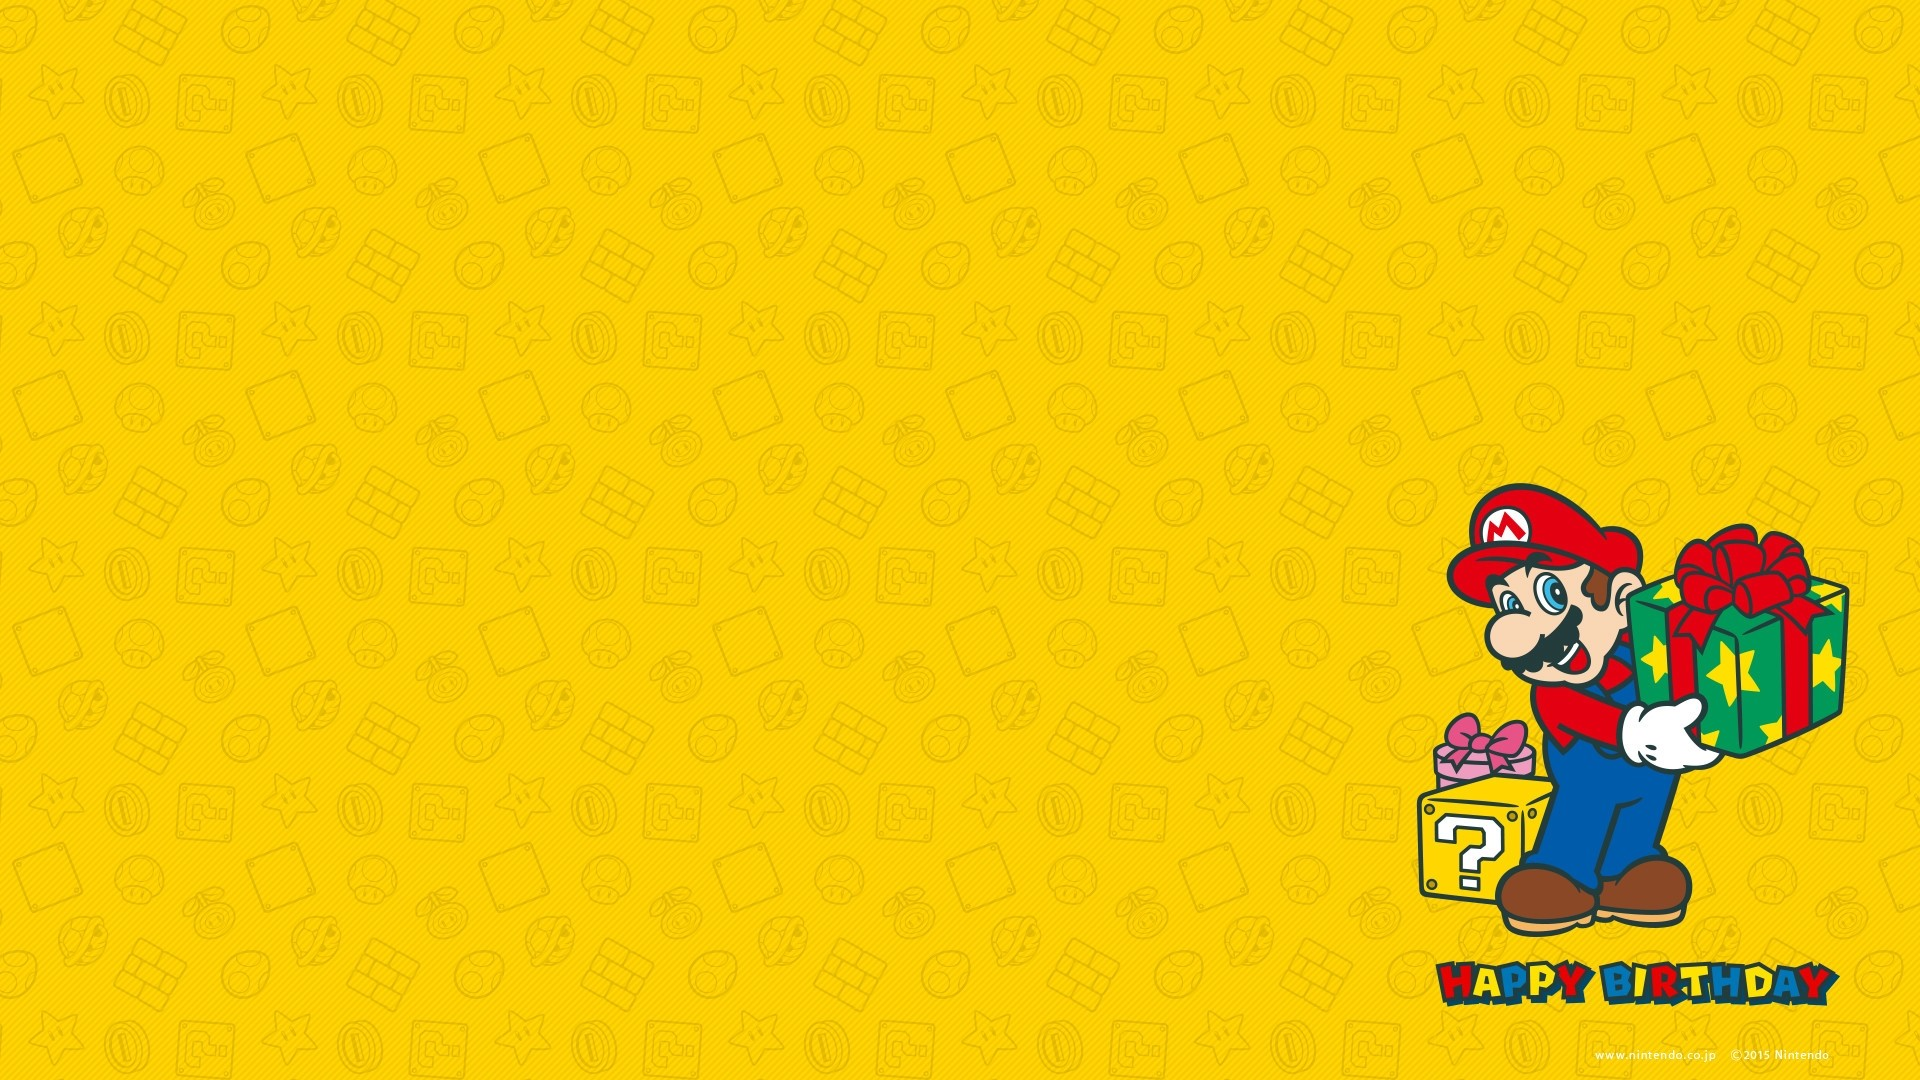 Nintendo HD Download